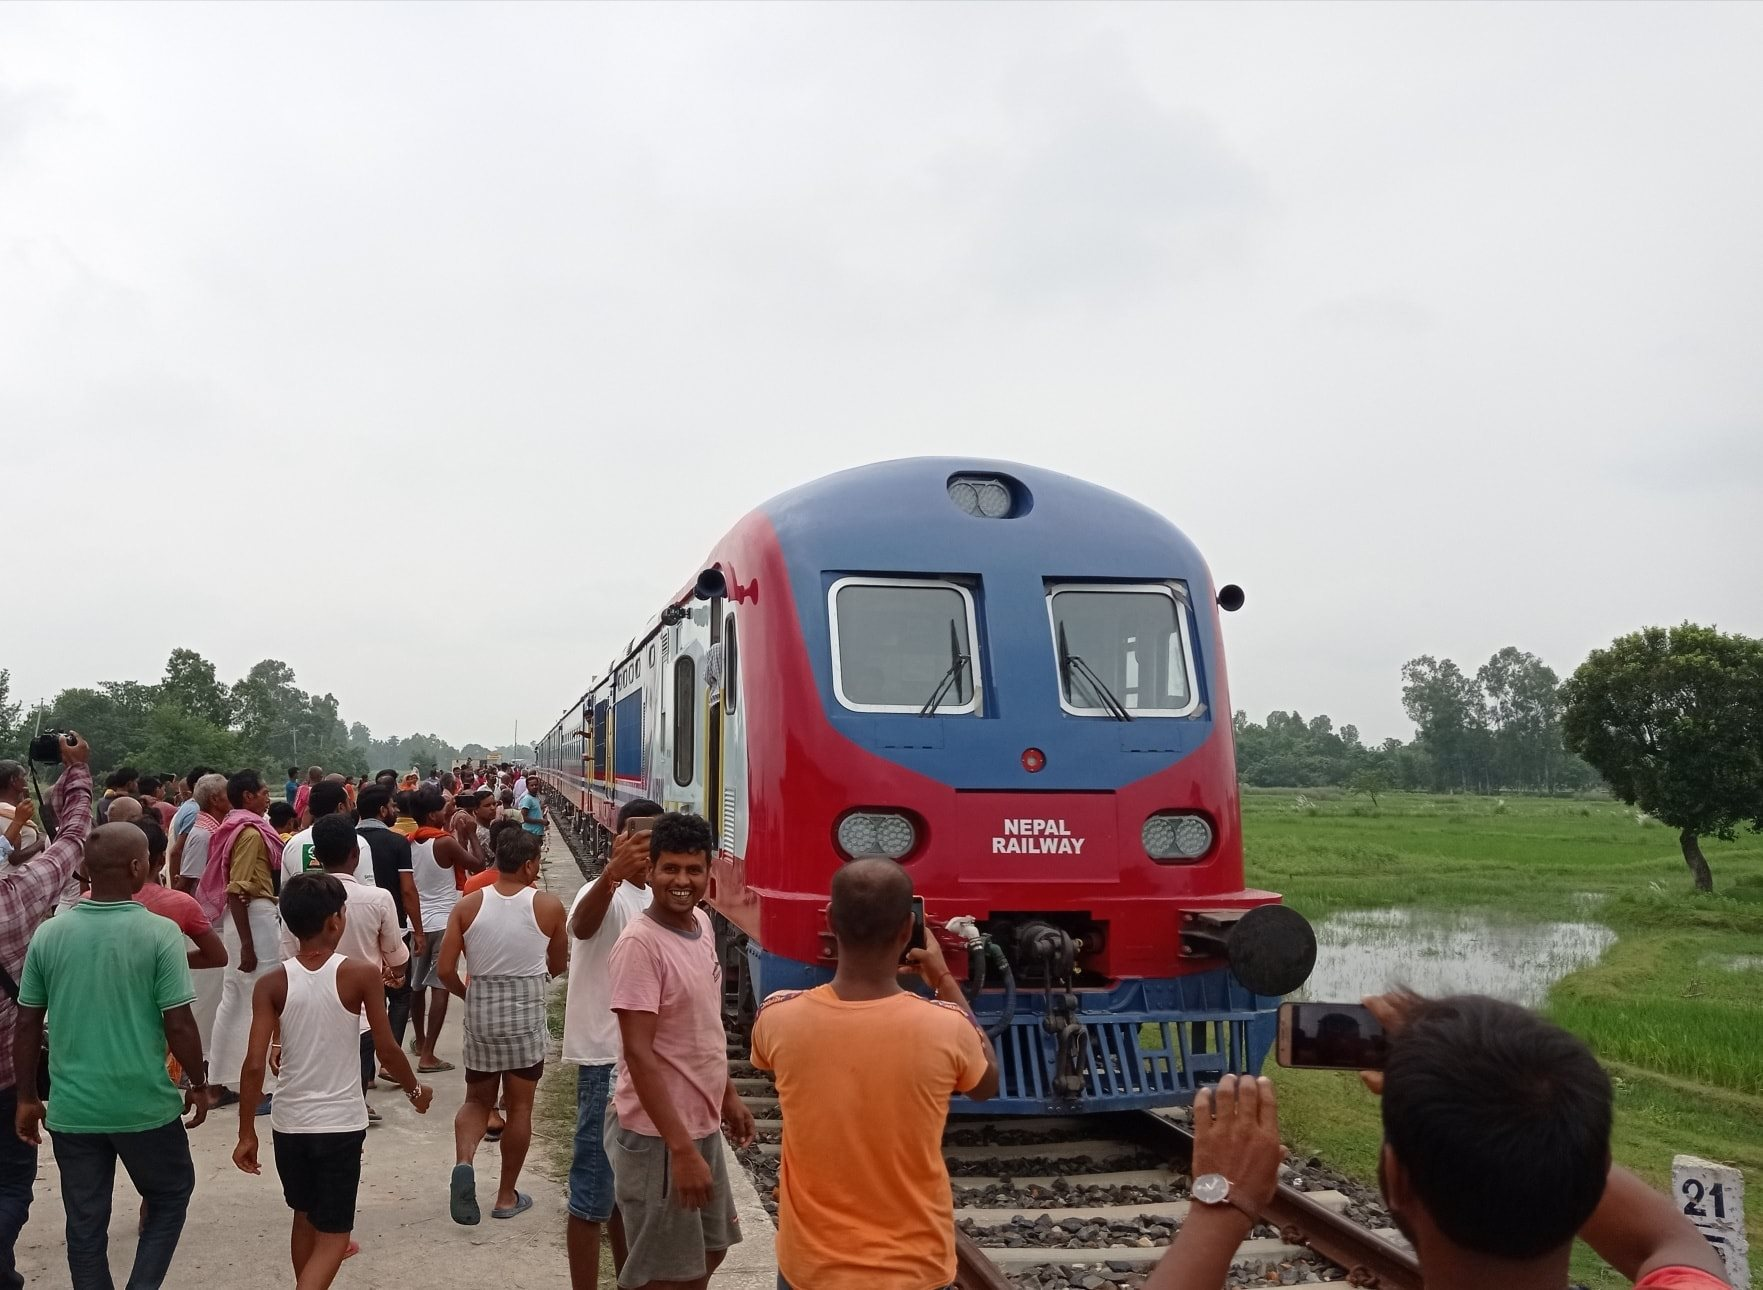 नेपालमा रेल यातायाततर्फको अर्काे यात्रा शुरु